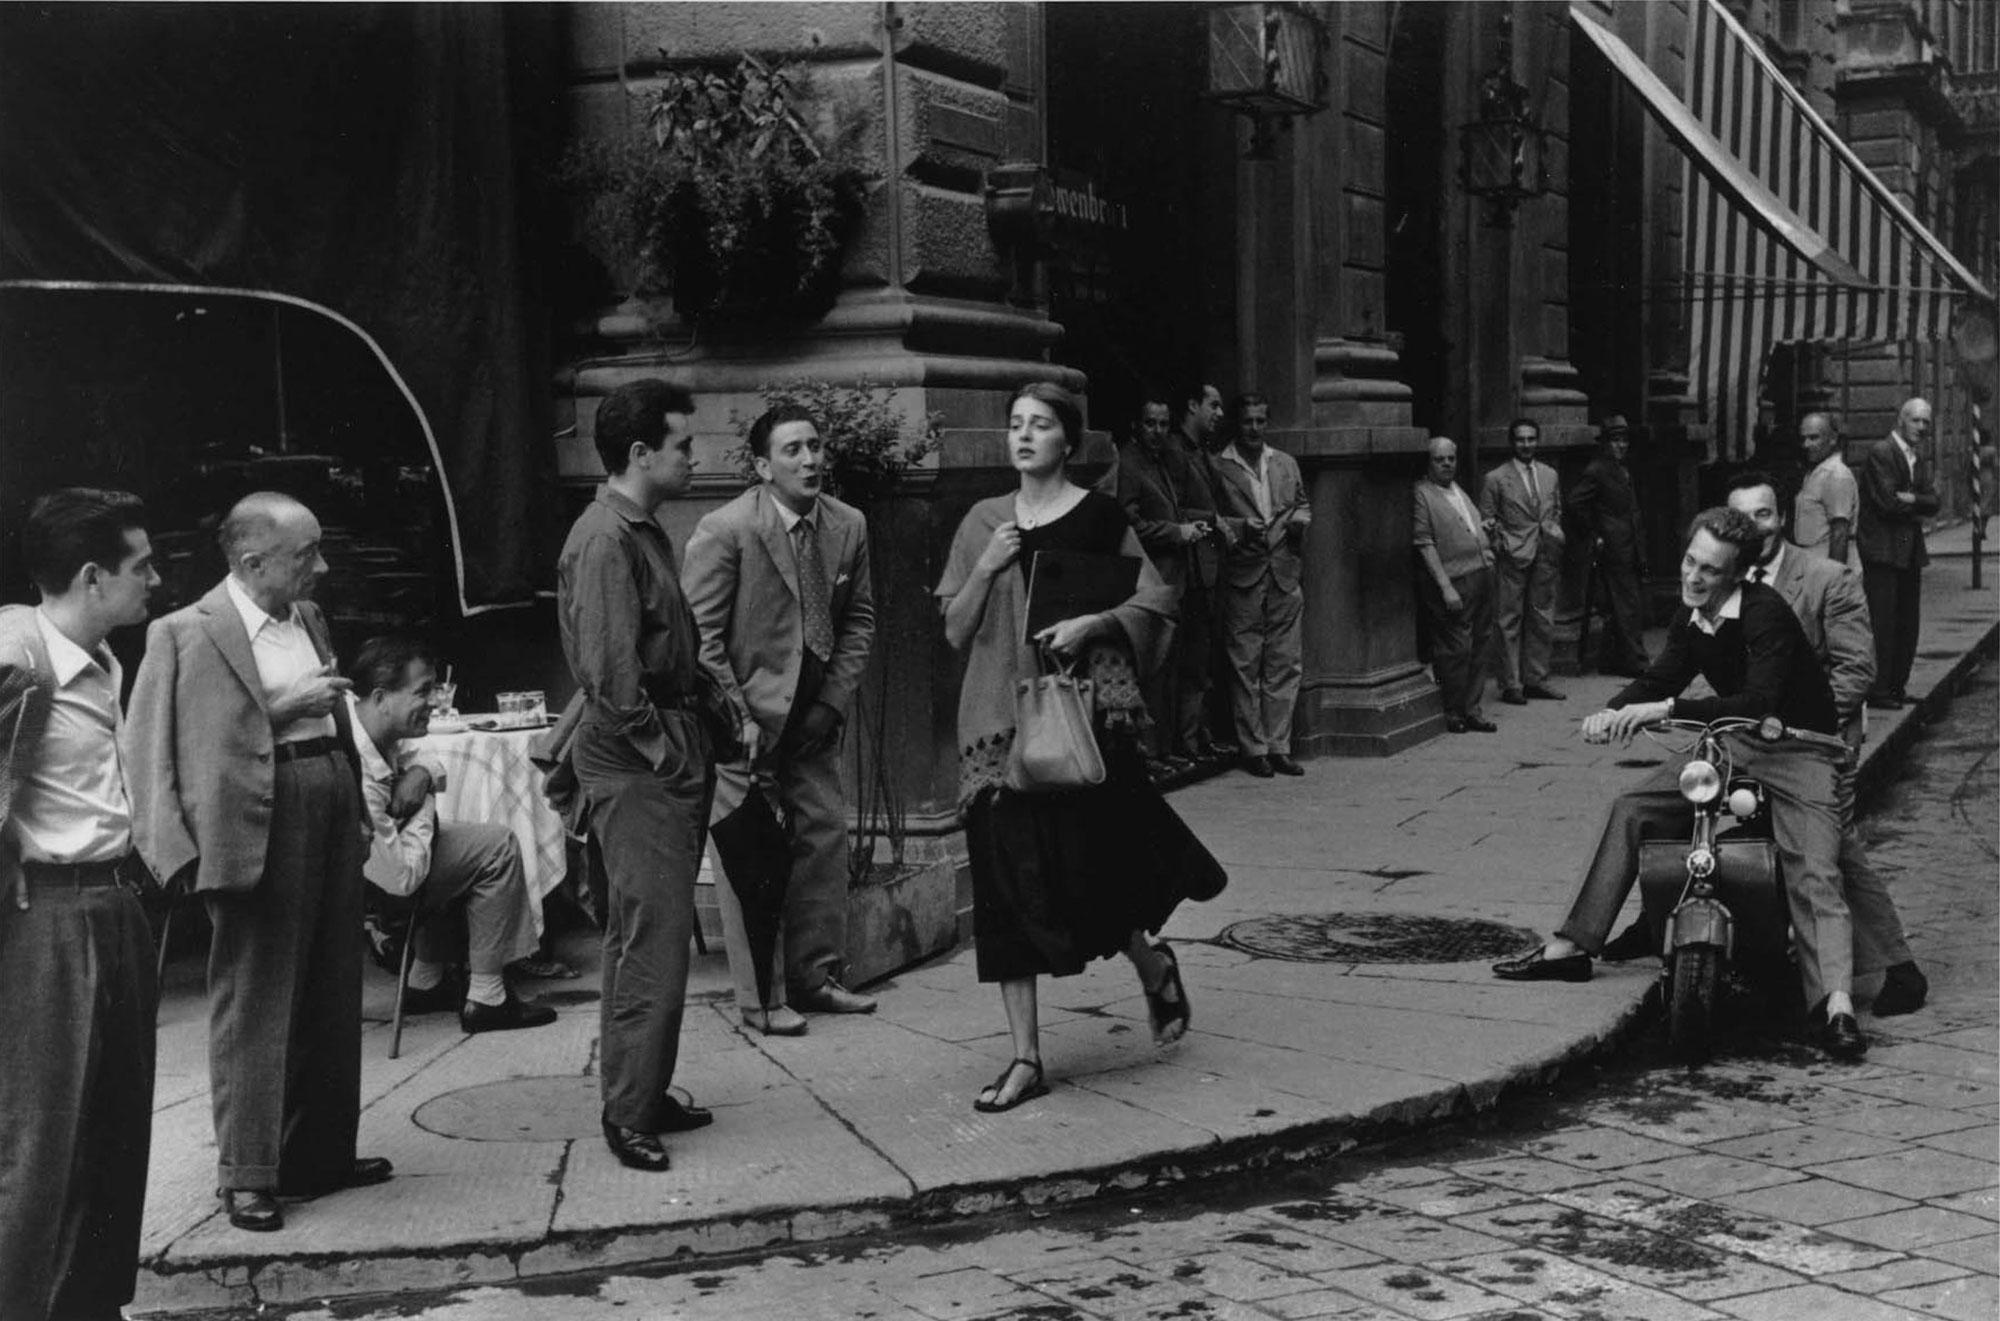 Ruth Orkin American Girl in Florence Italy 1951